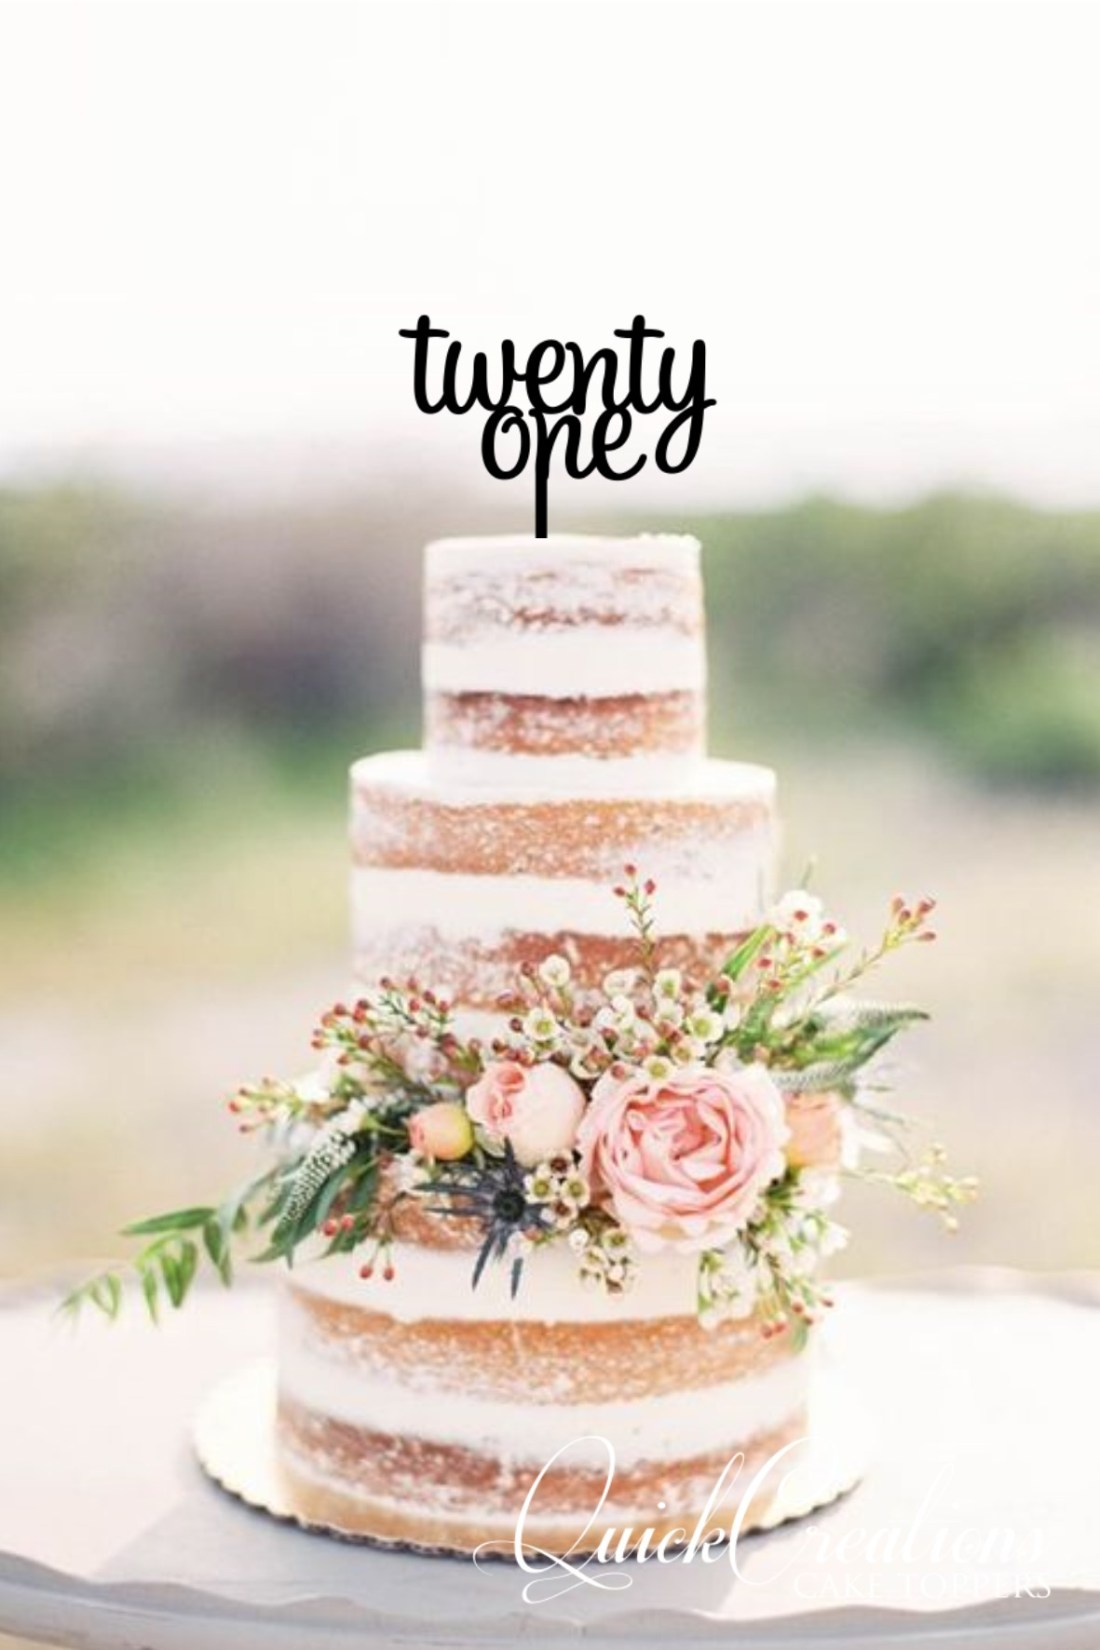 Quick Creations Cake Topper - twenty one v3